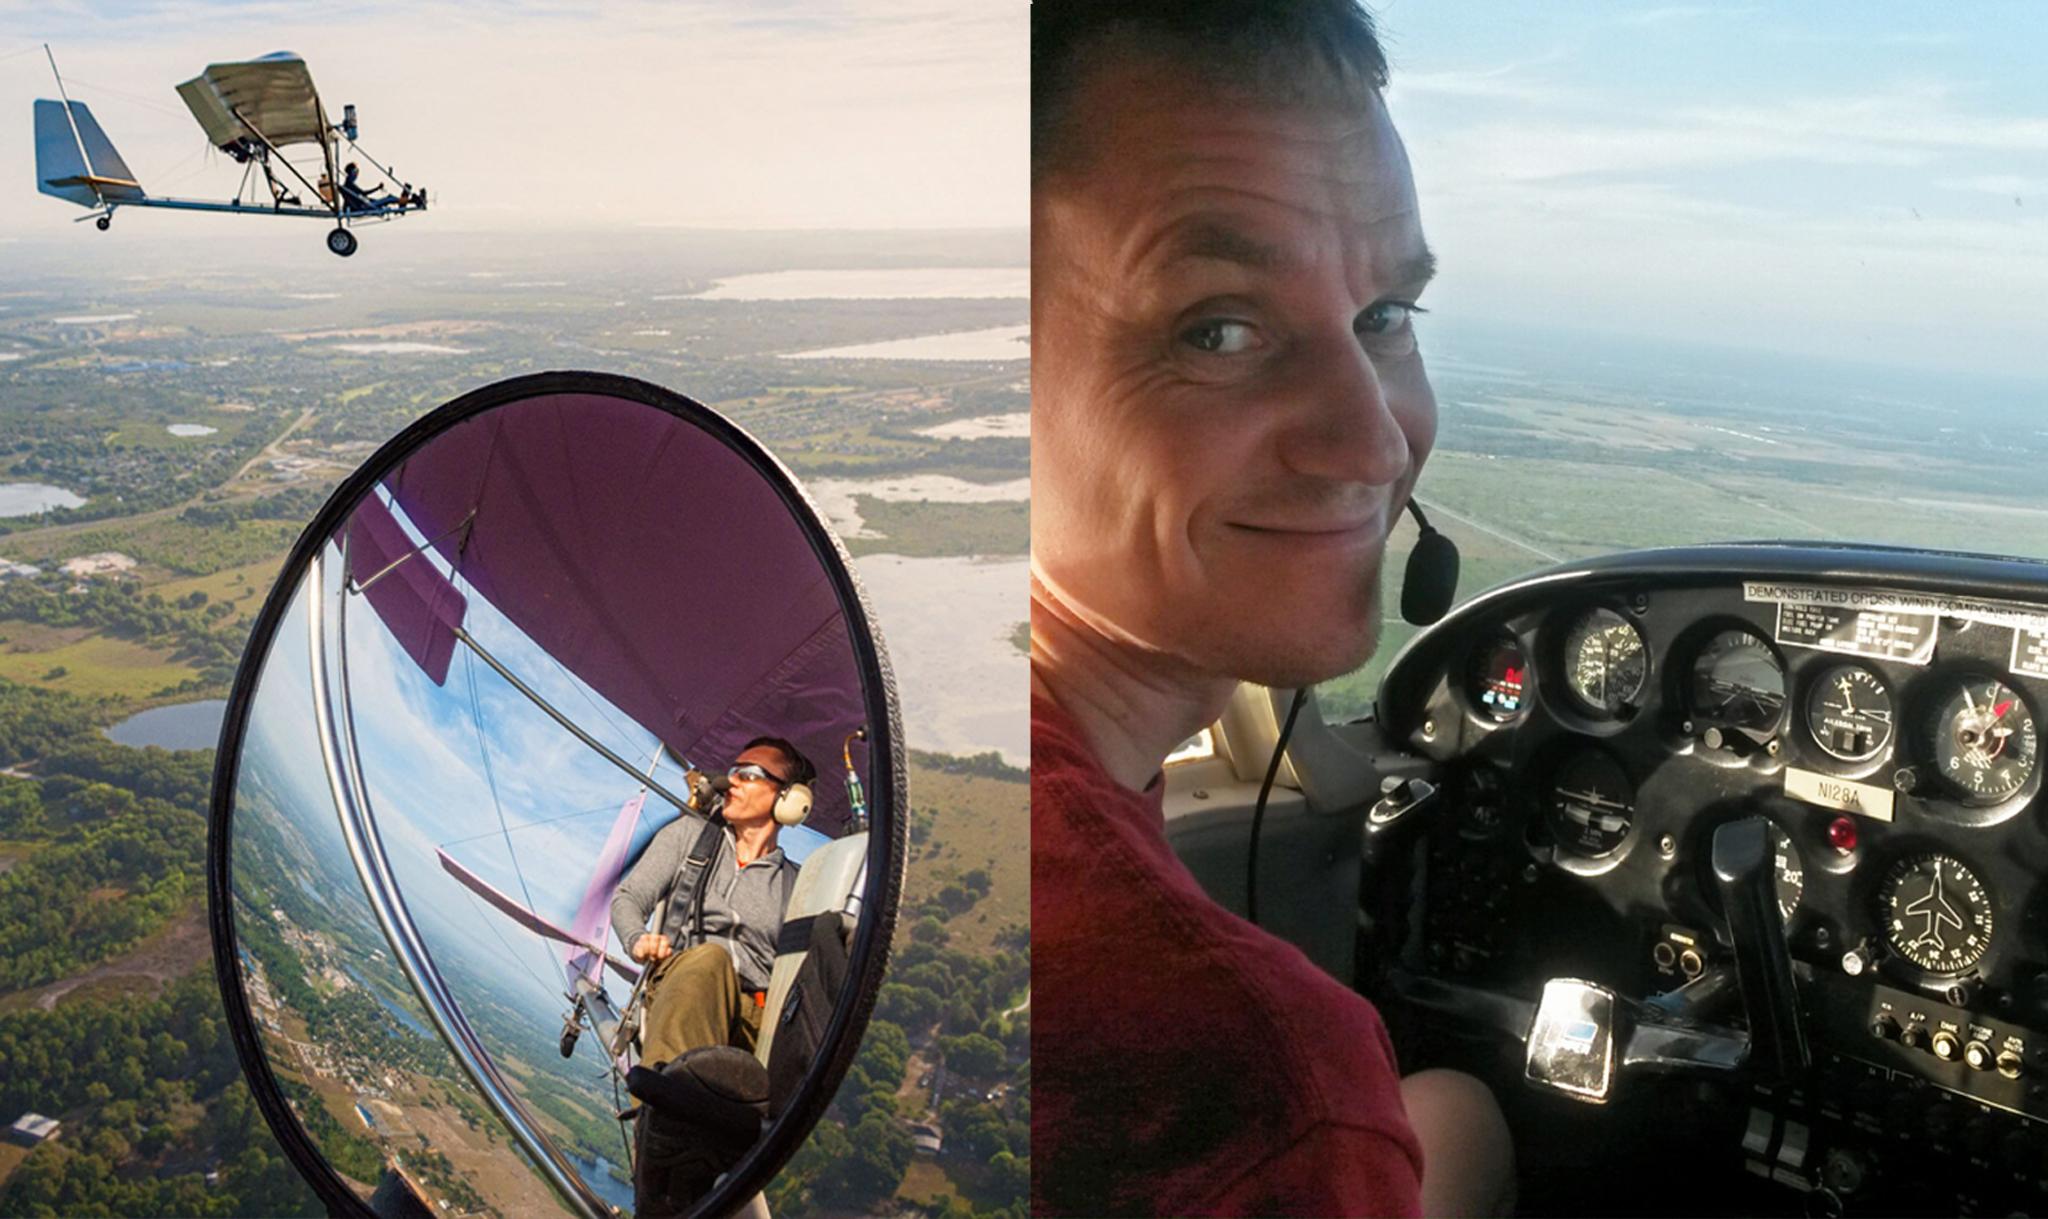 How we became private pilots in the United States. Pt.2 - Как мы учились в США на частных пилотов. Часть 2